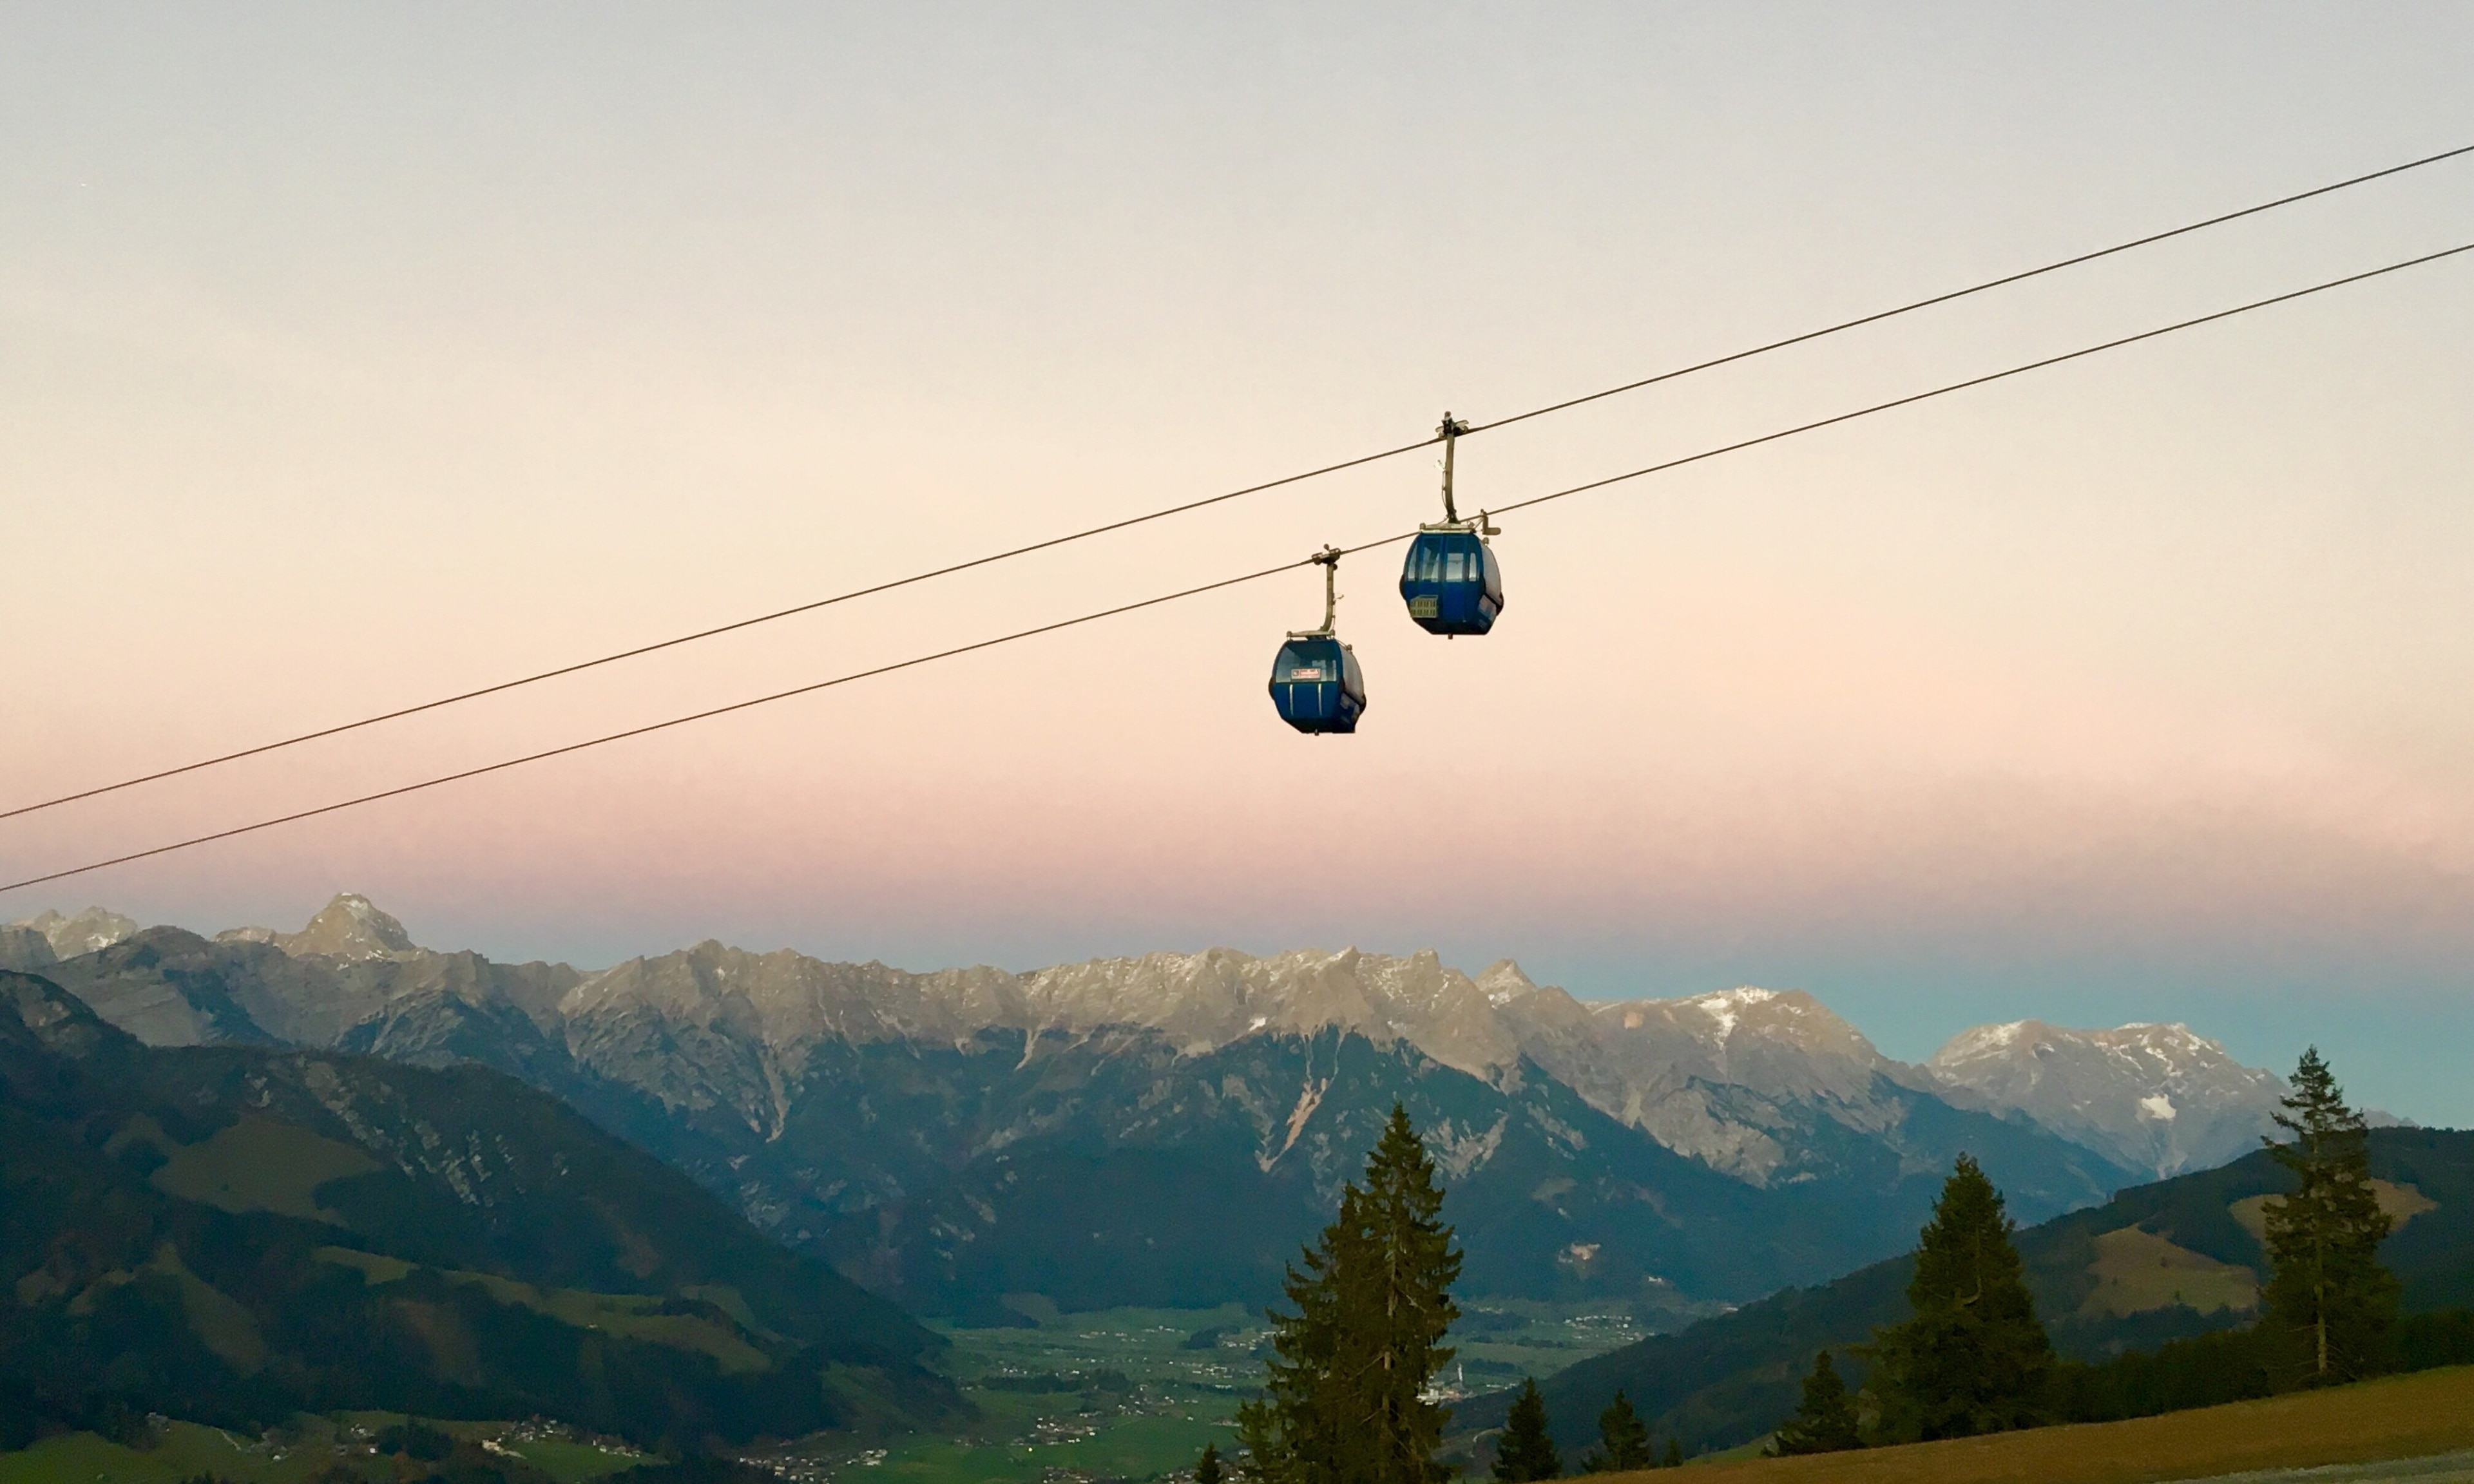 Leogang, Salzburg State, Austria